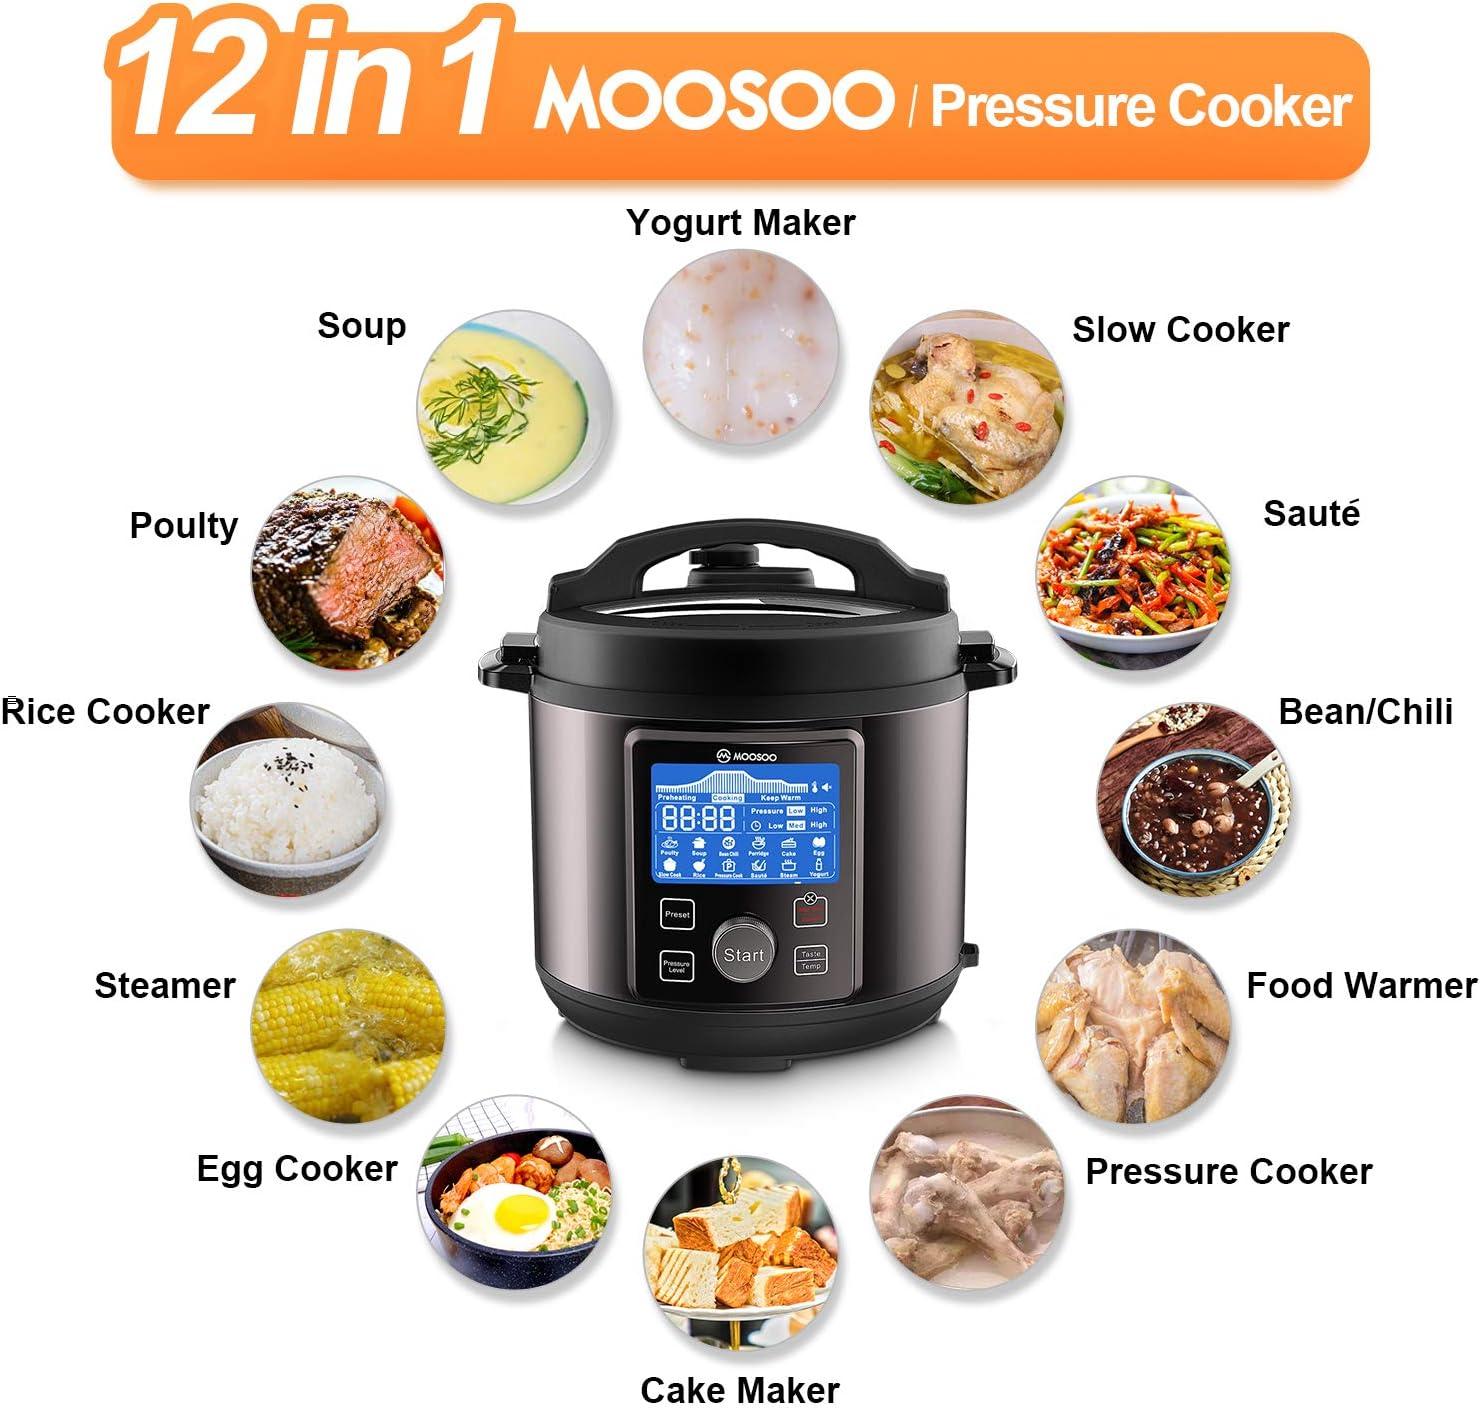 MOOSOO 13-in-1 Instant Digital Pressure Pot - Electric Pressure Cooker